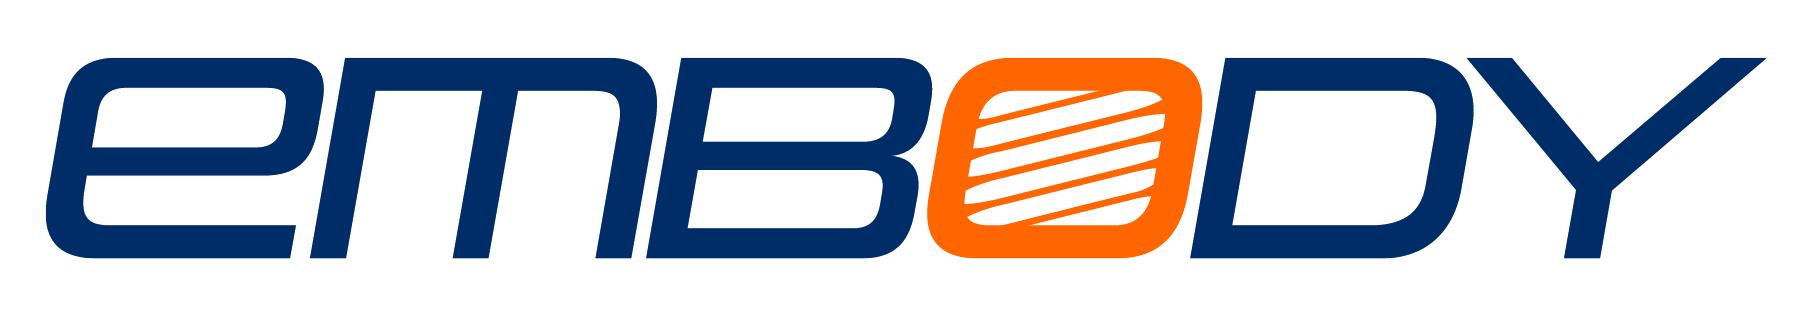 Copy of embody logo 2017 cmyk-01 - Jeff Conroy.jpg